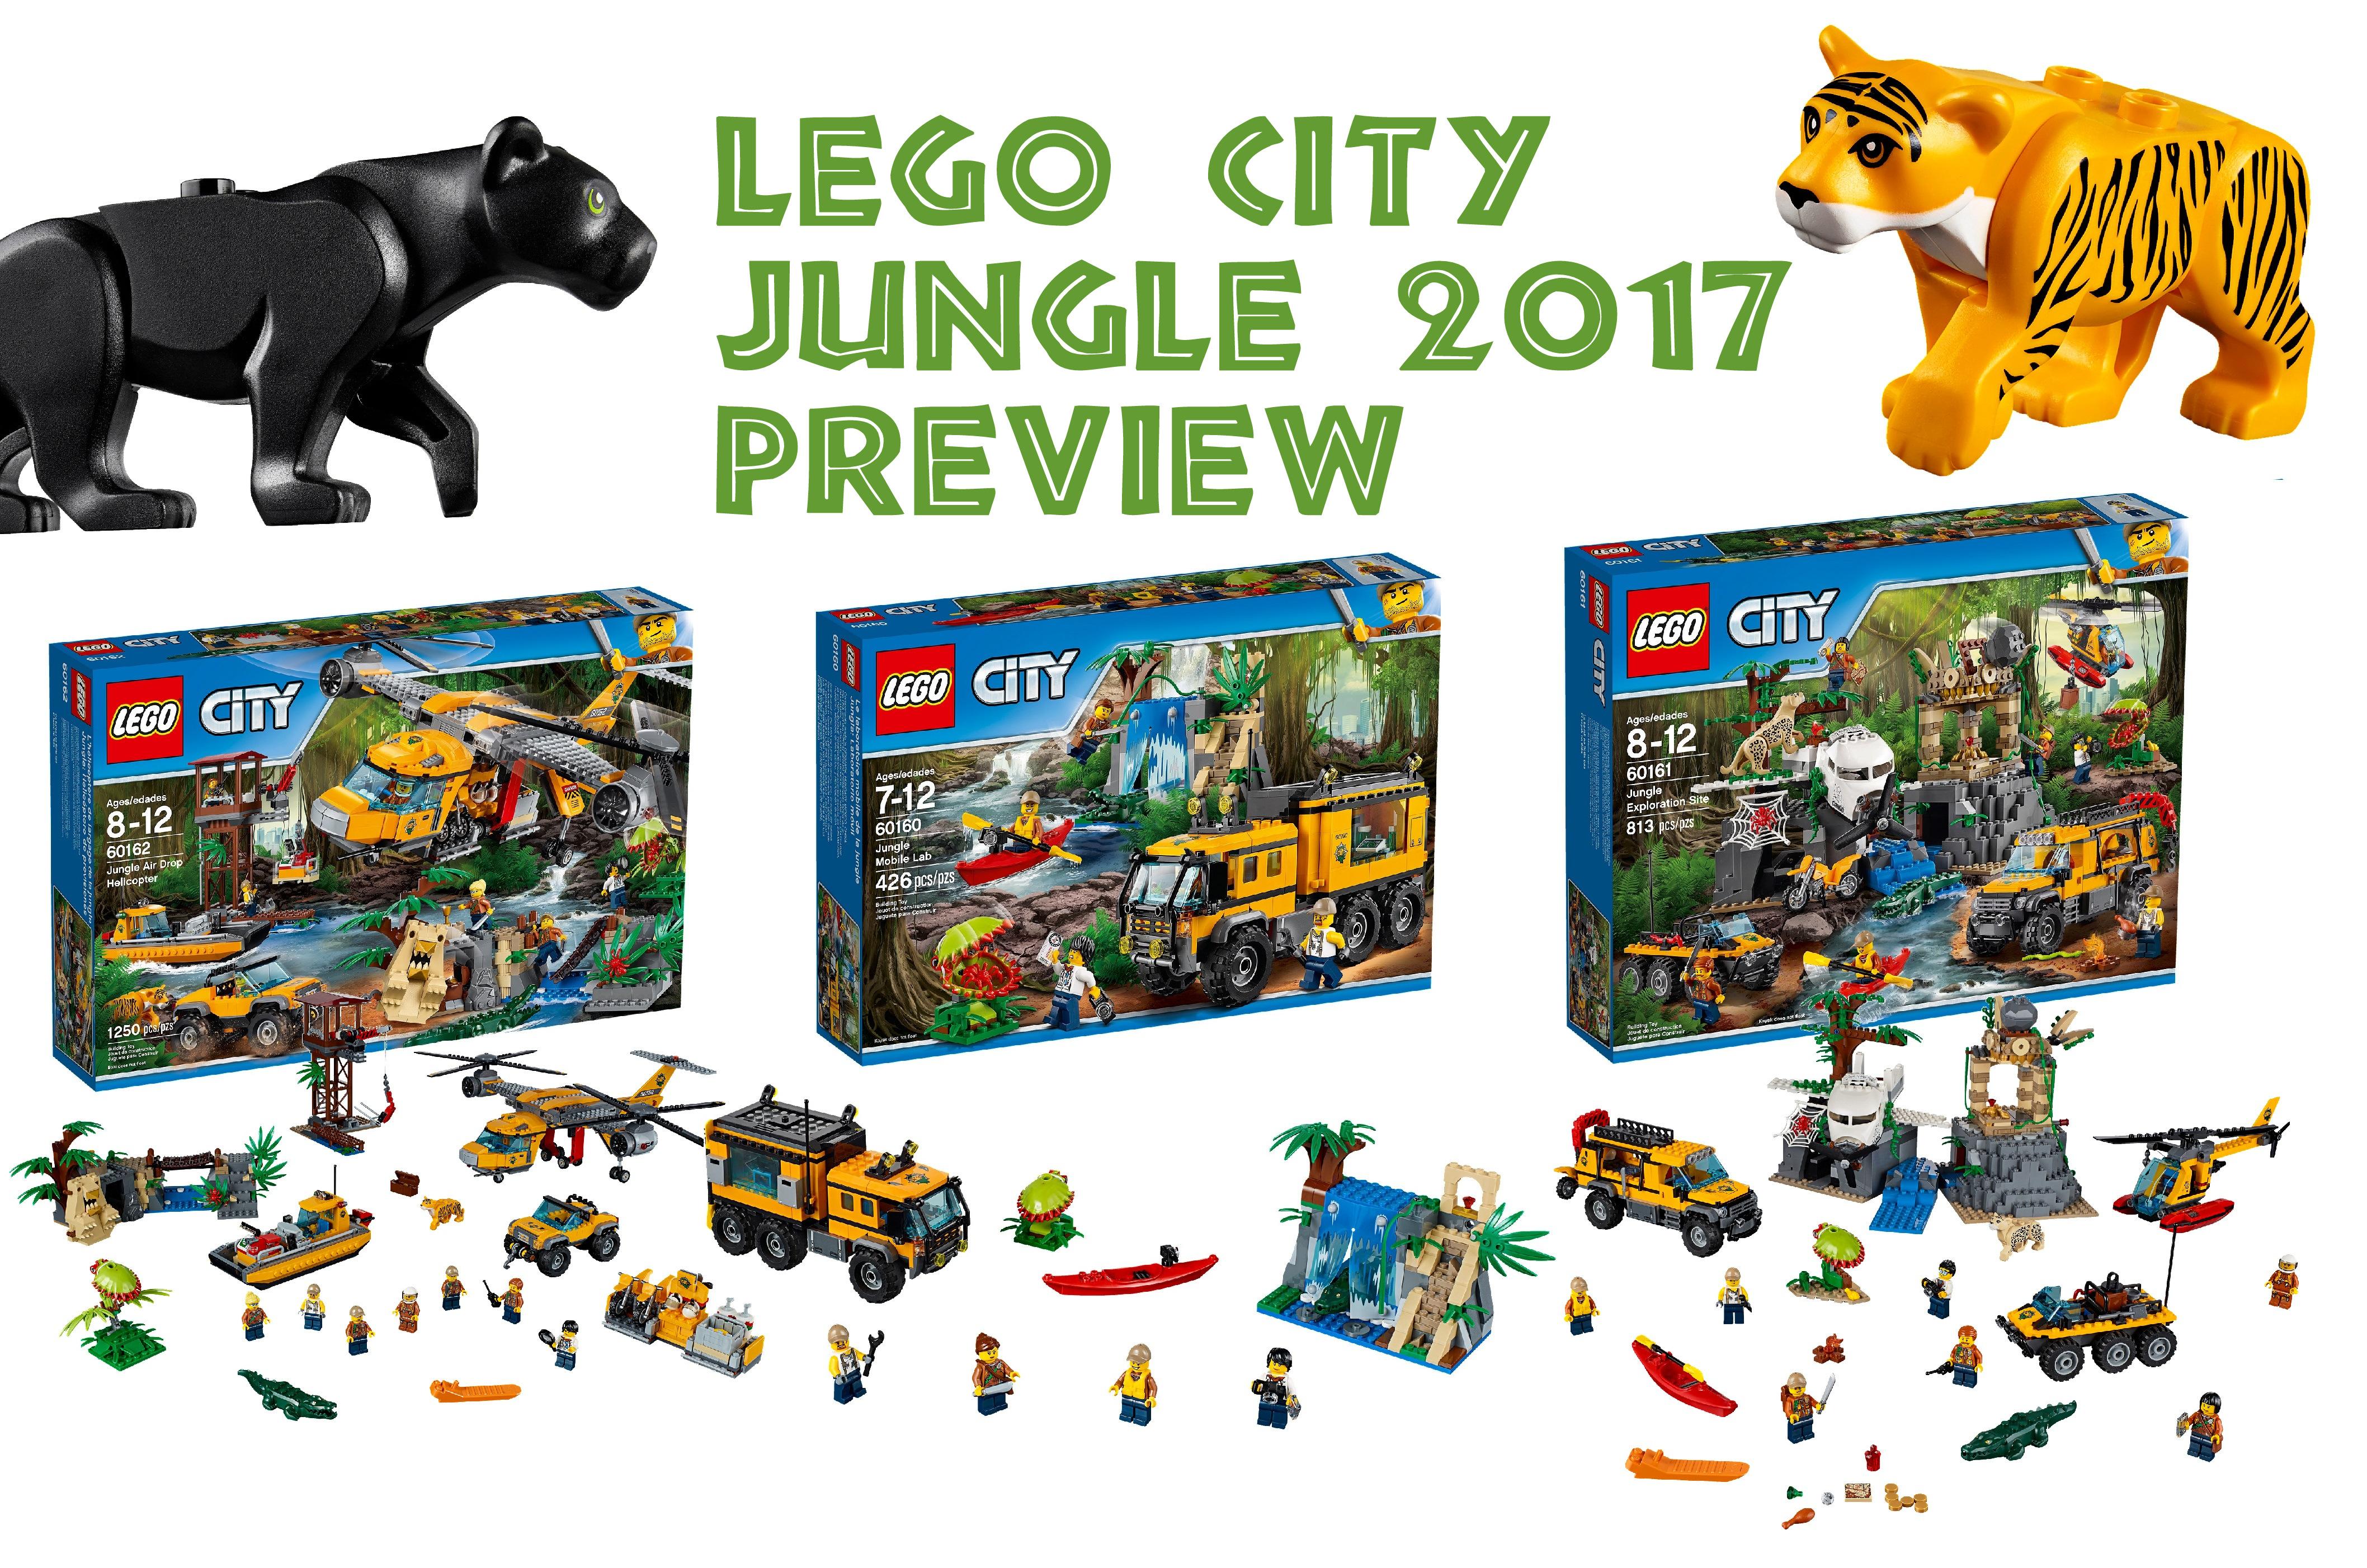 Preview LEGO City Jungle 2017 Sets